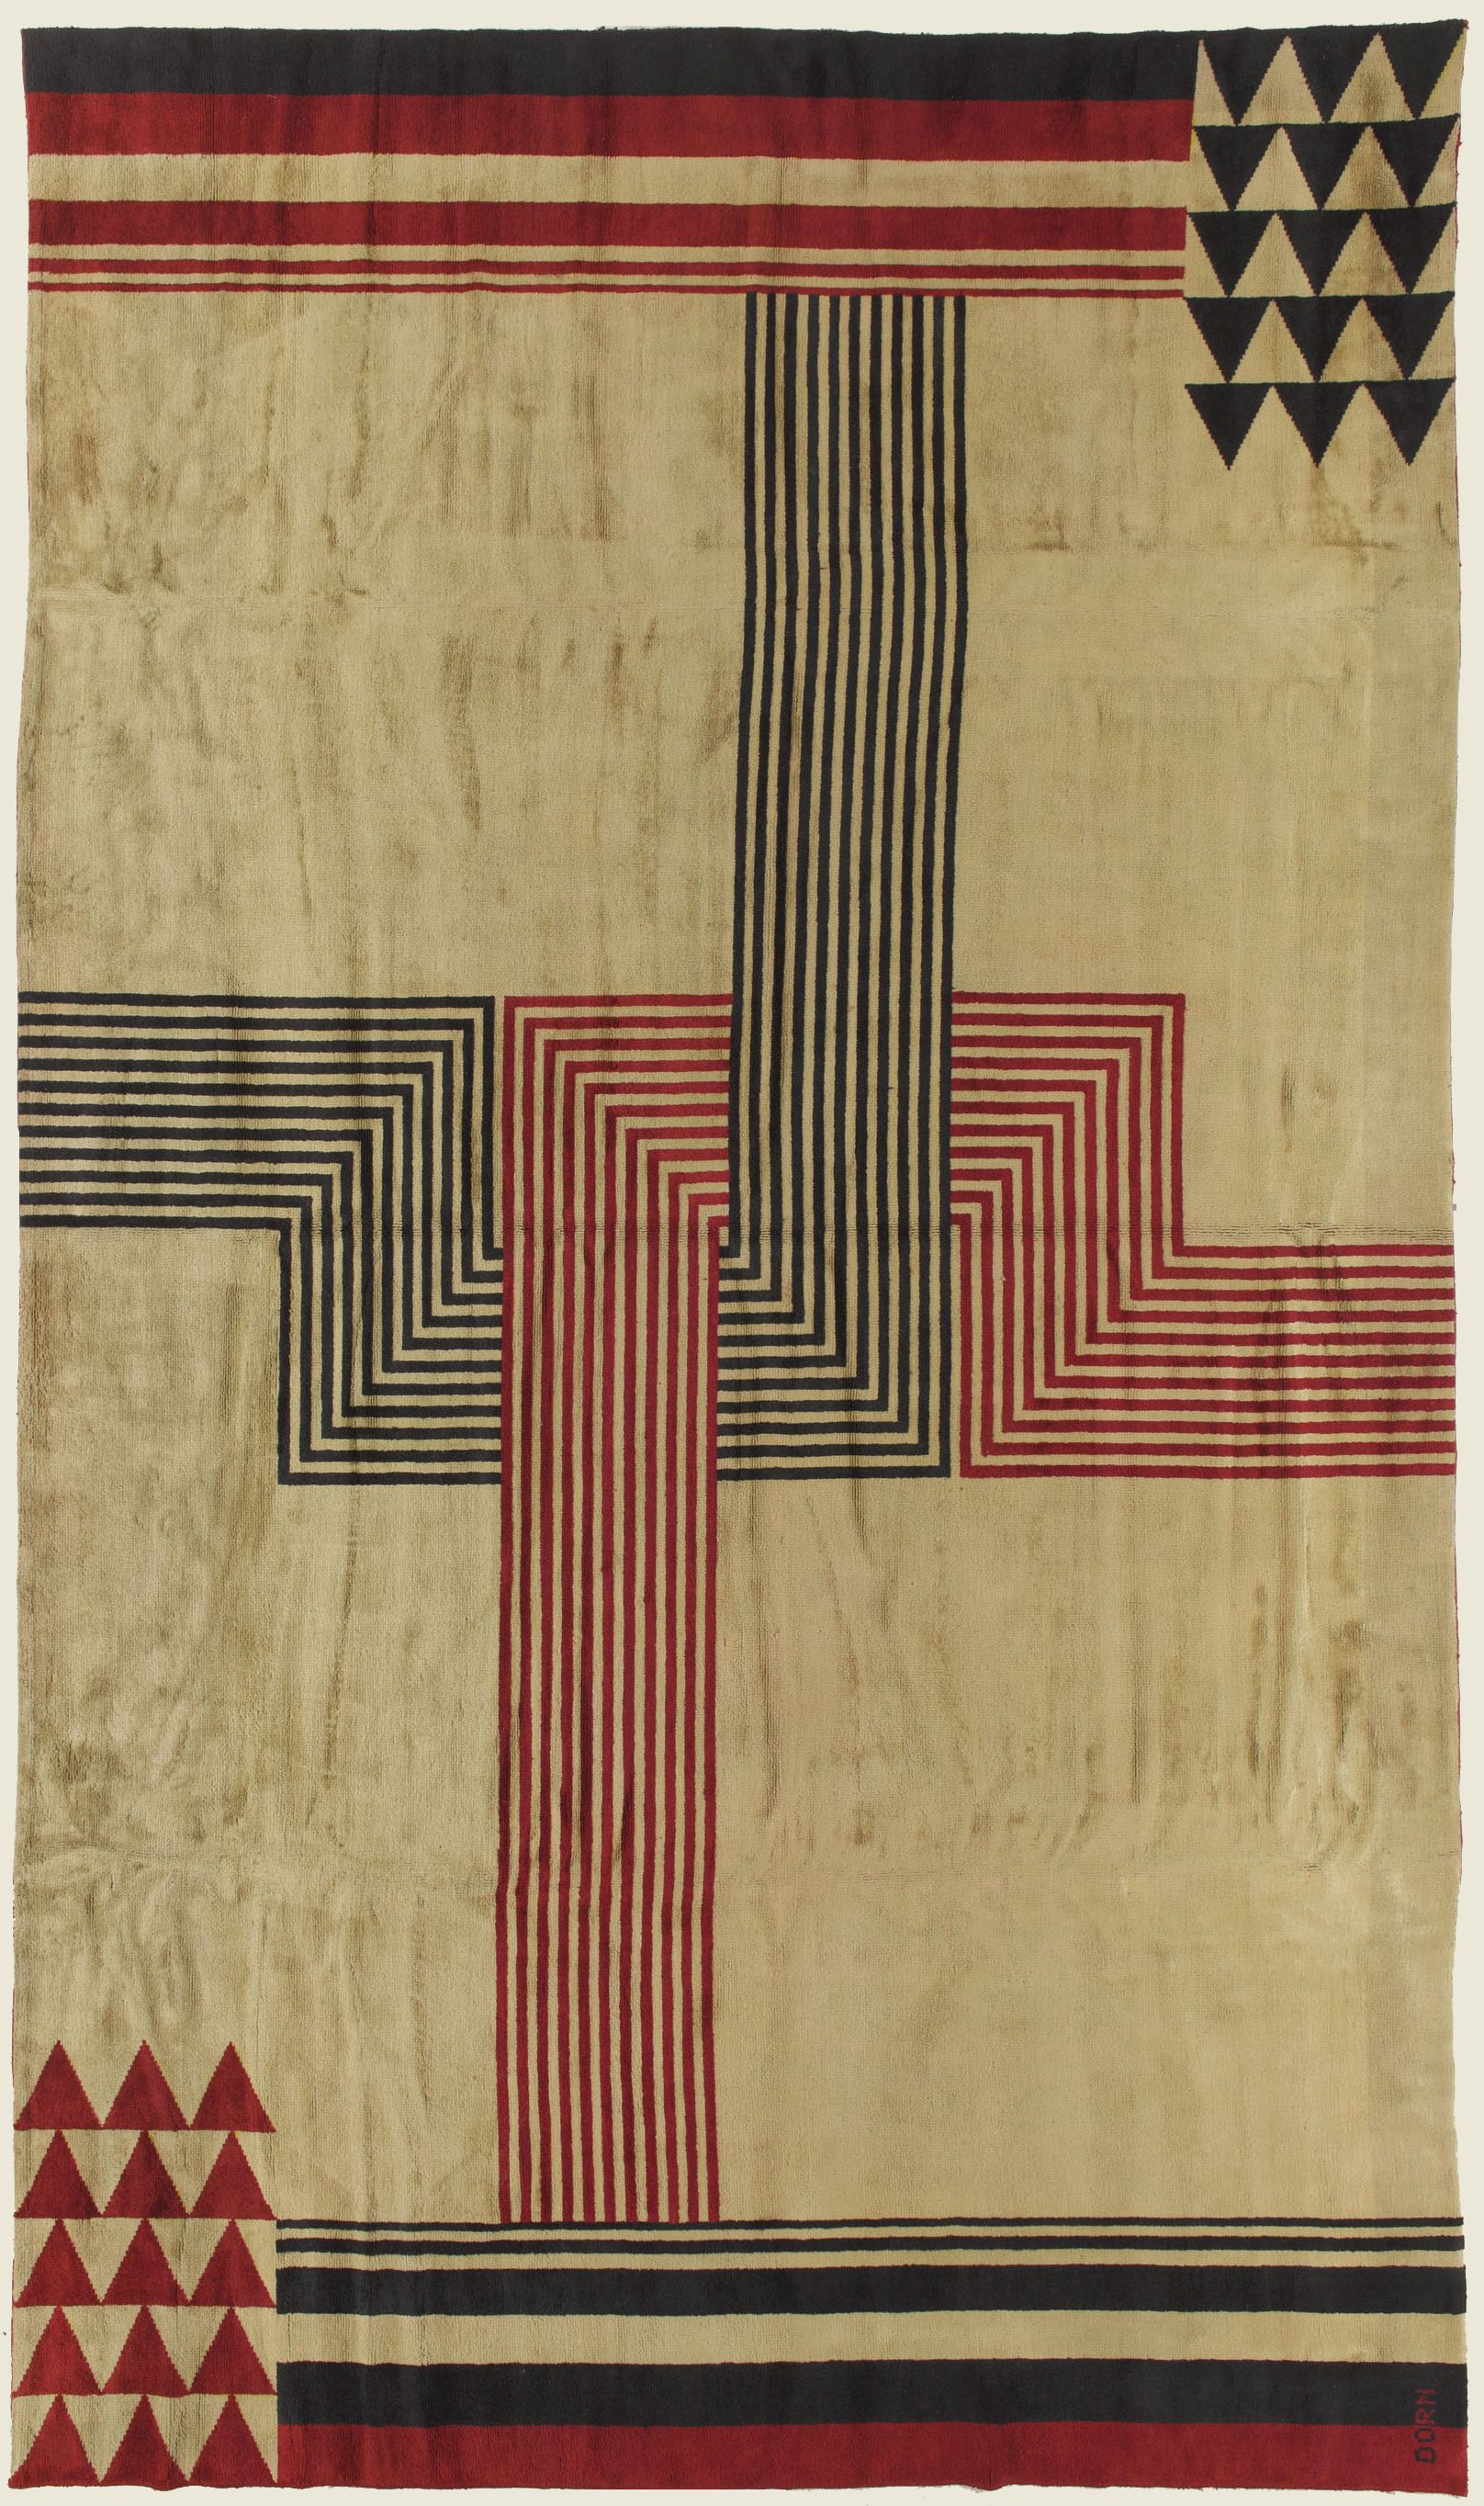 Marion Dorn American 18961964 textile designer